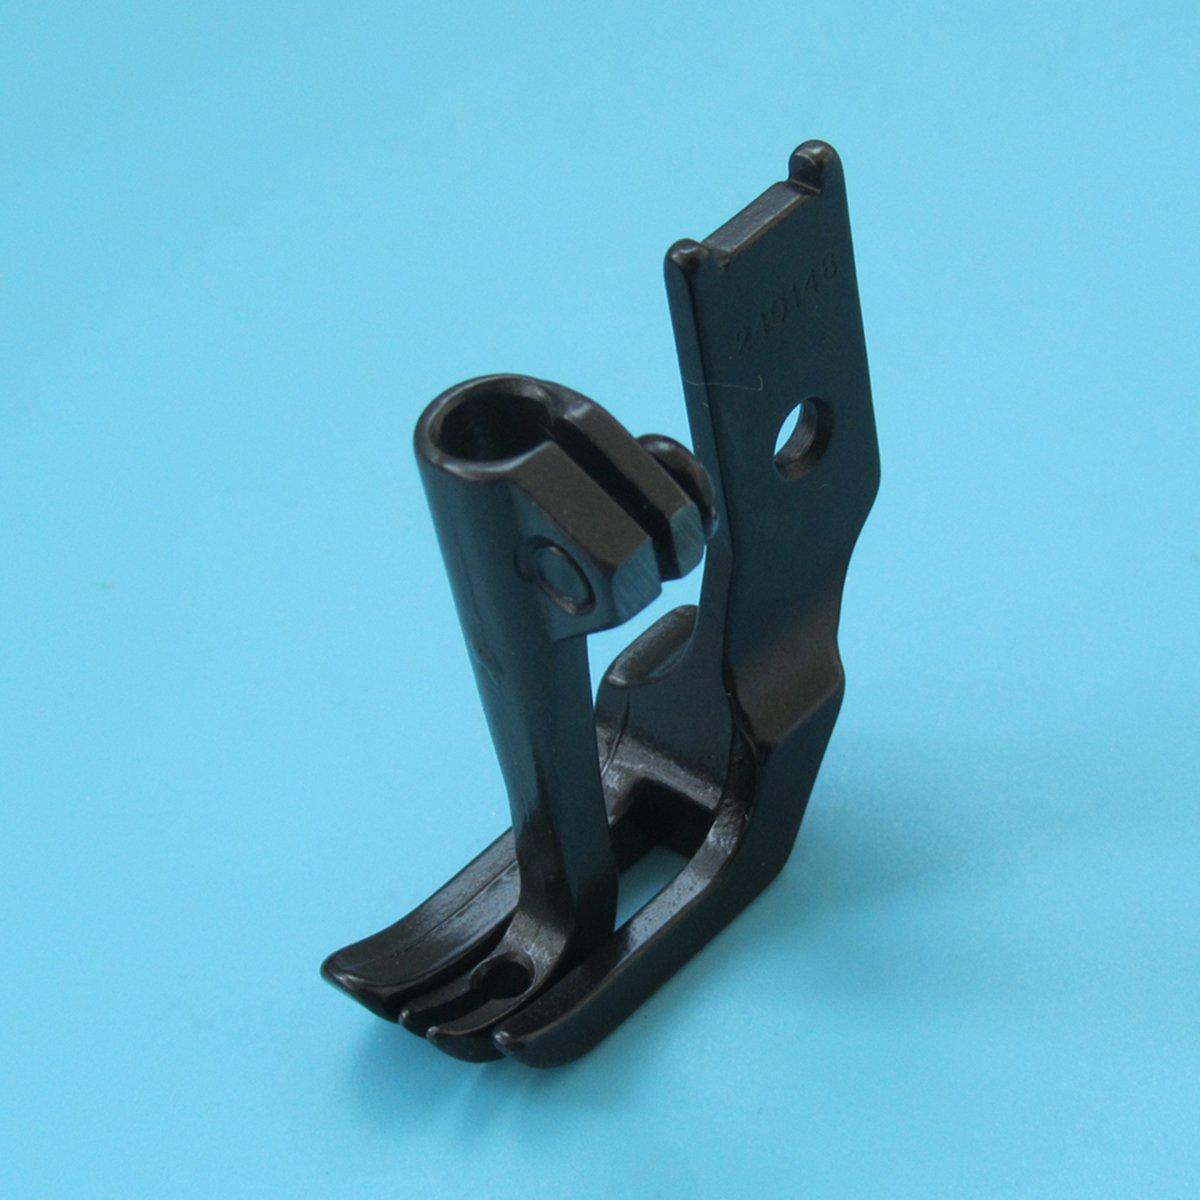 240149WG 1SET piedino set con split all interno del piede per macchine industriali Walking Foot Kunpeng/ /# 240148/